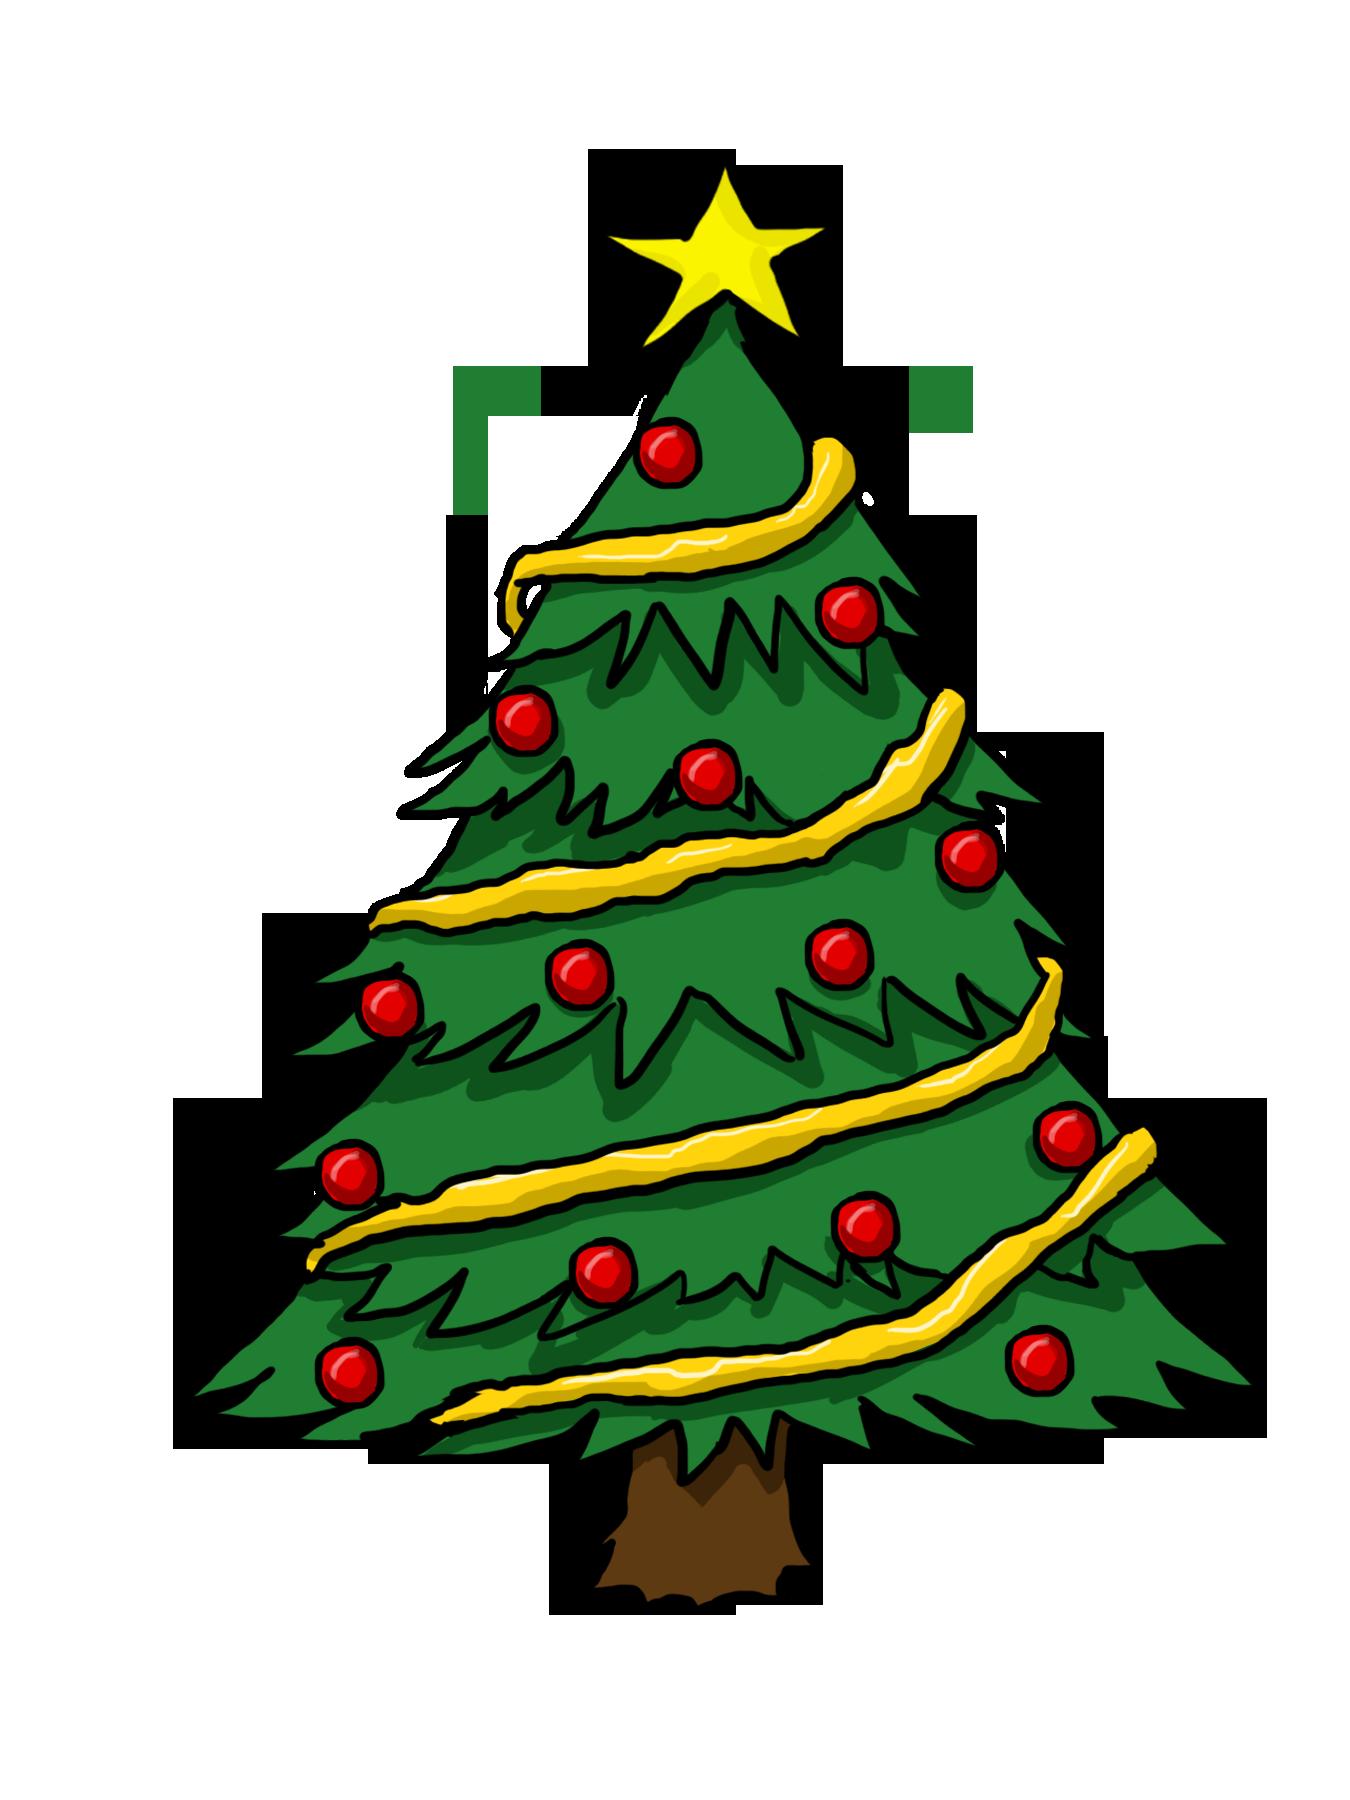 Clip art is a. Hawaiian clipart christmas tree